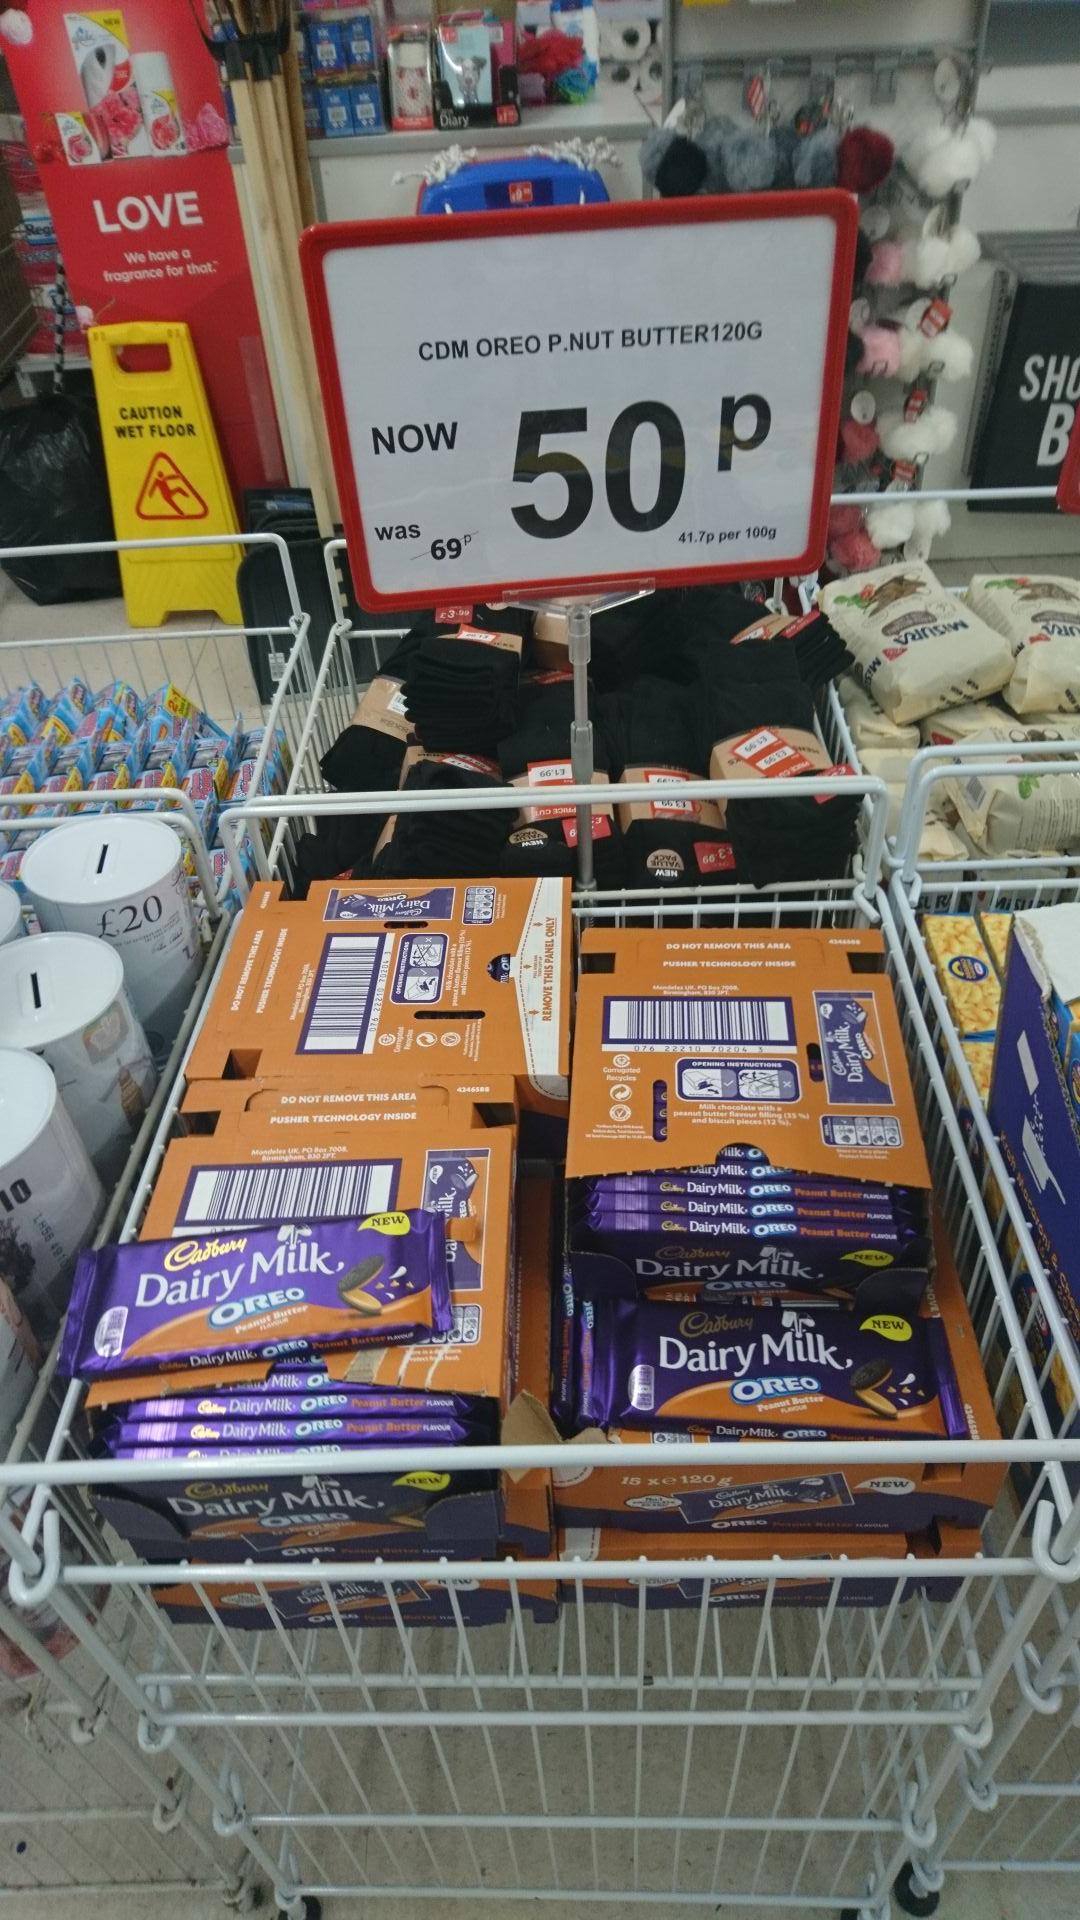 Cadbury dairy milk Oreo peanut butter 120g - 50p instore @ Poundstretcher